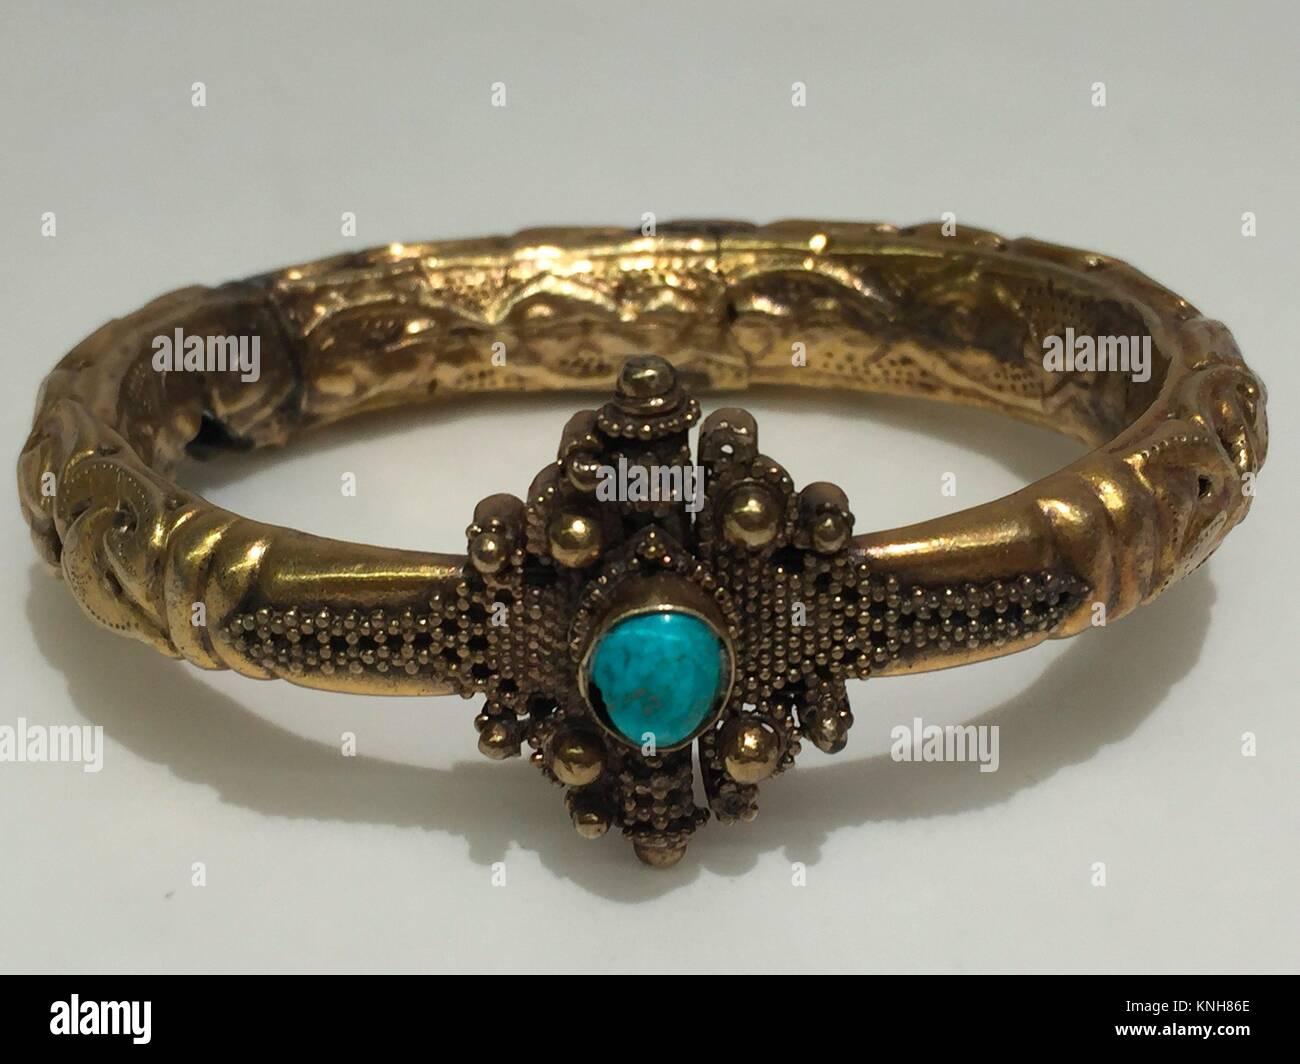 Brazalete. Fecha: 11th-12th century; Geografía: atribuido a Siria; Media: Oro, turquesa; Dimensiones: Diam. Imagen De Stock